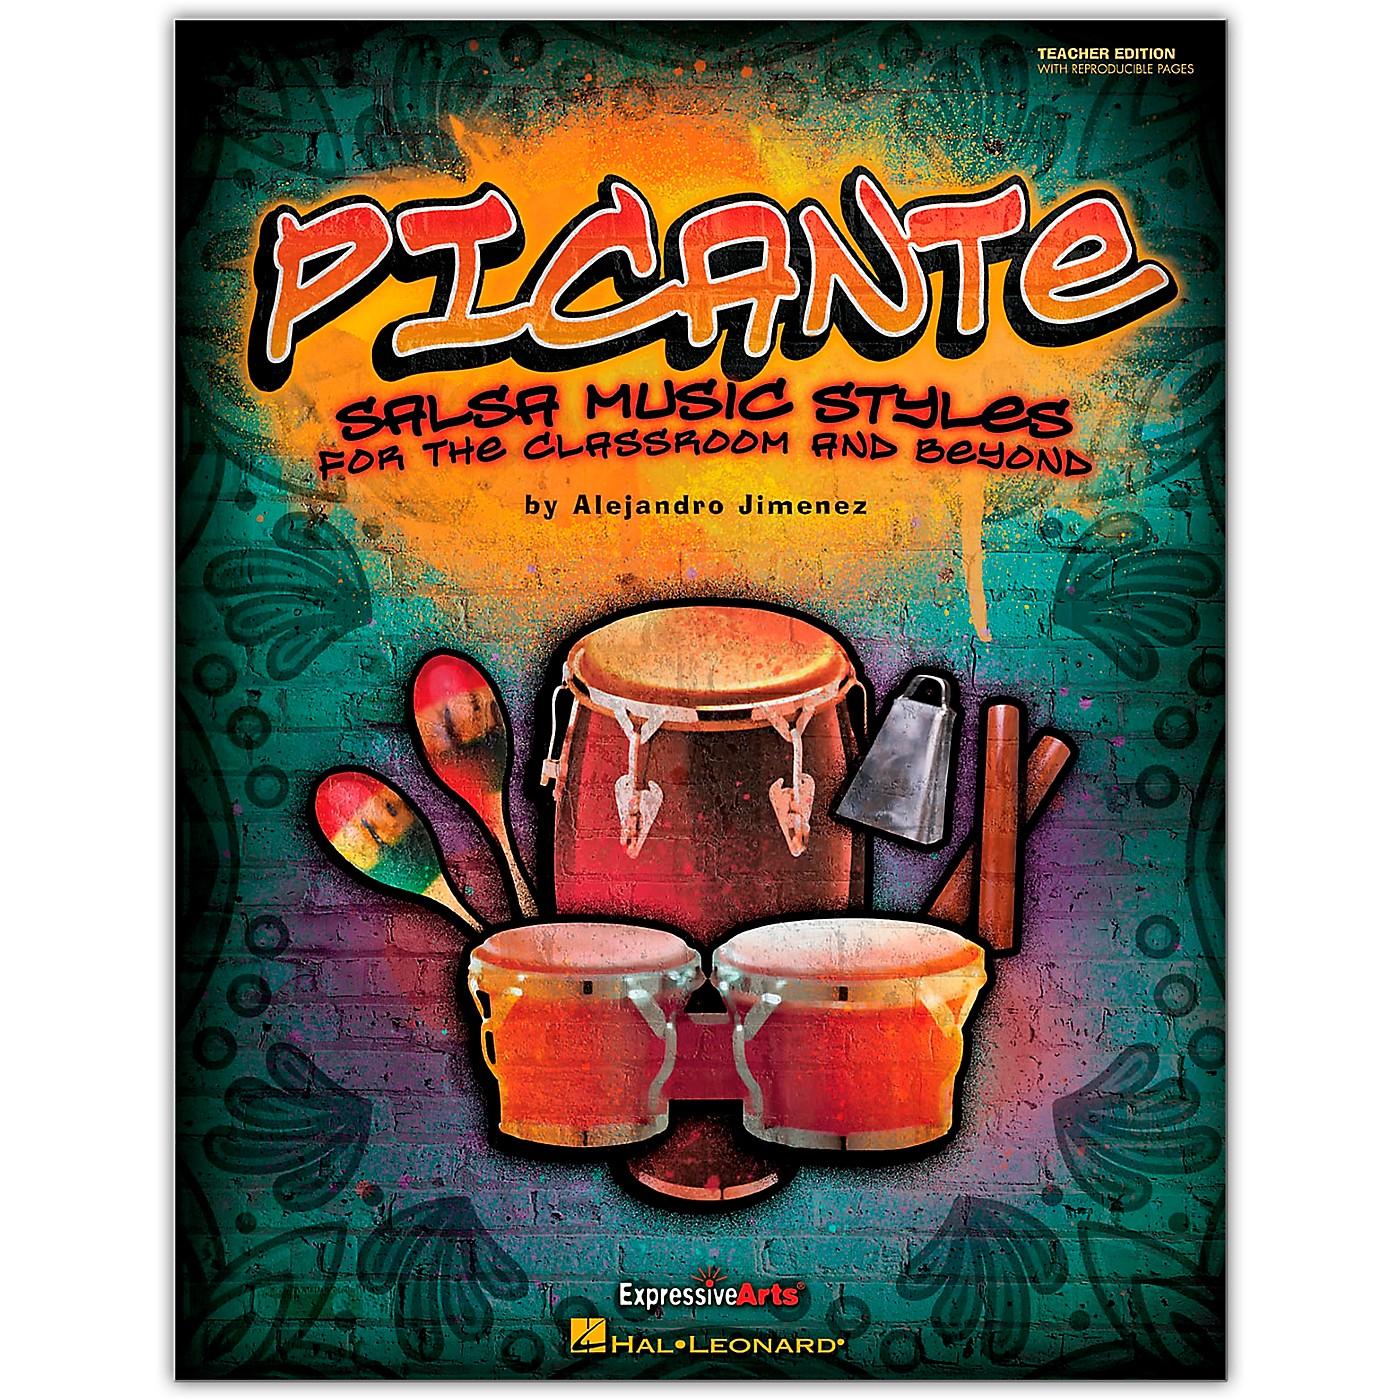 Hal Leonard Picante - Salsa Music Styles for the Classroom & Beyond Teacher's Edition (Orff) thumbnail